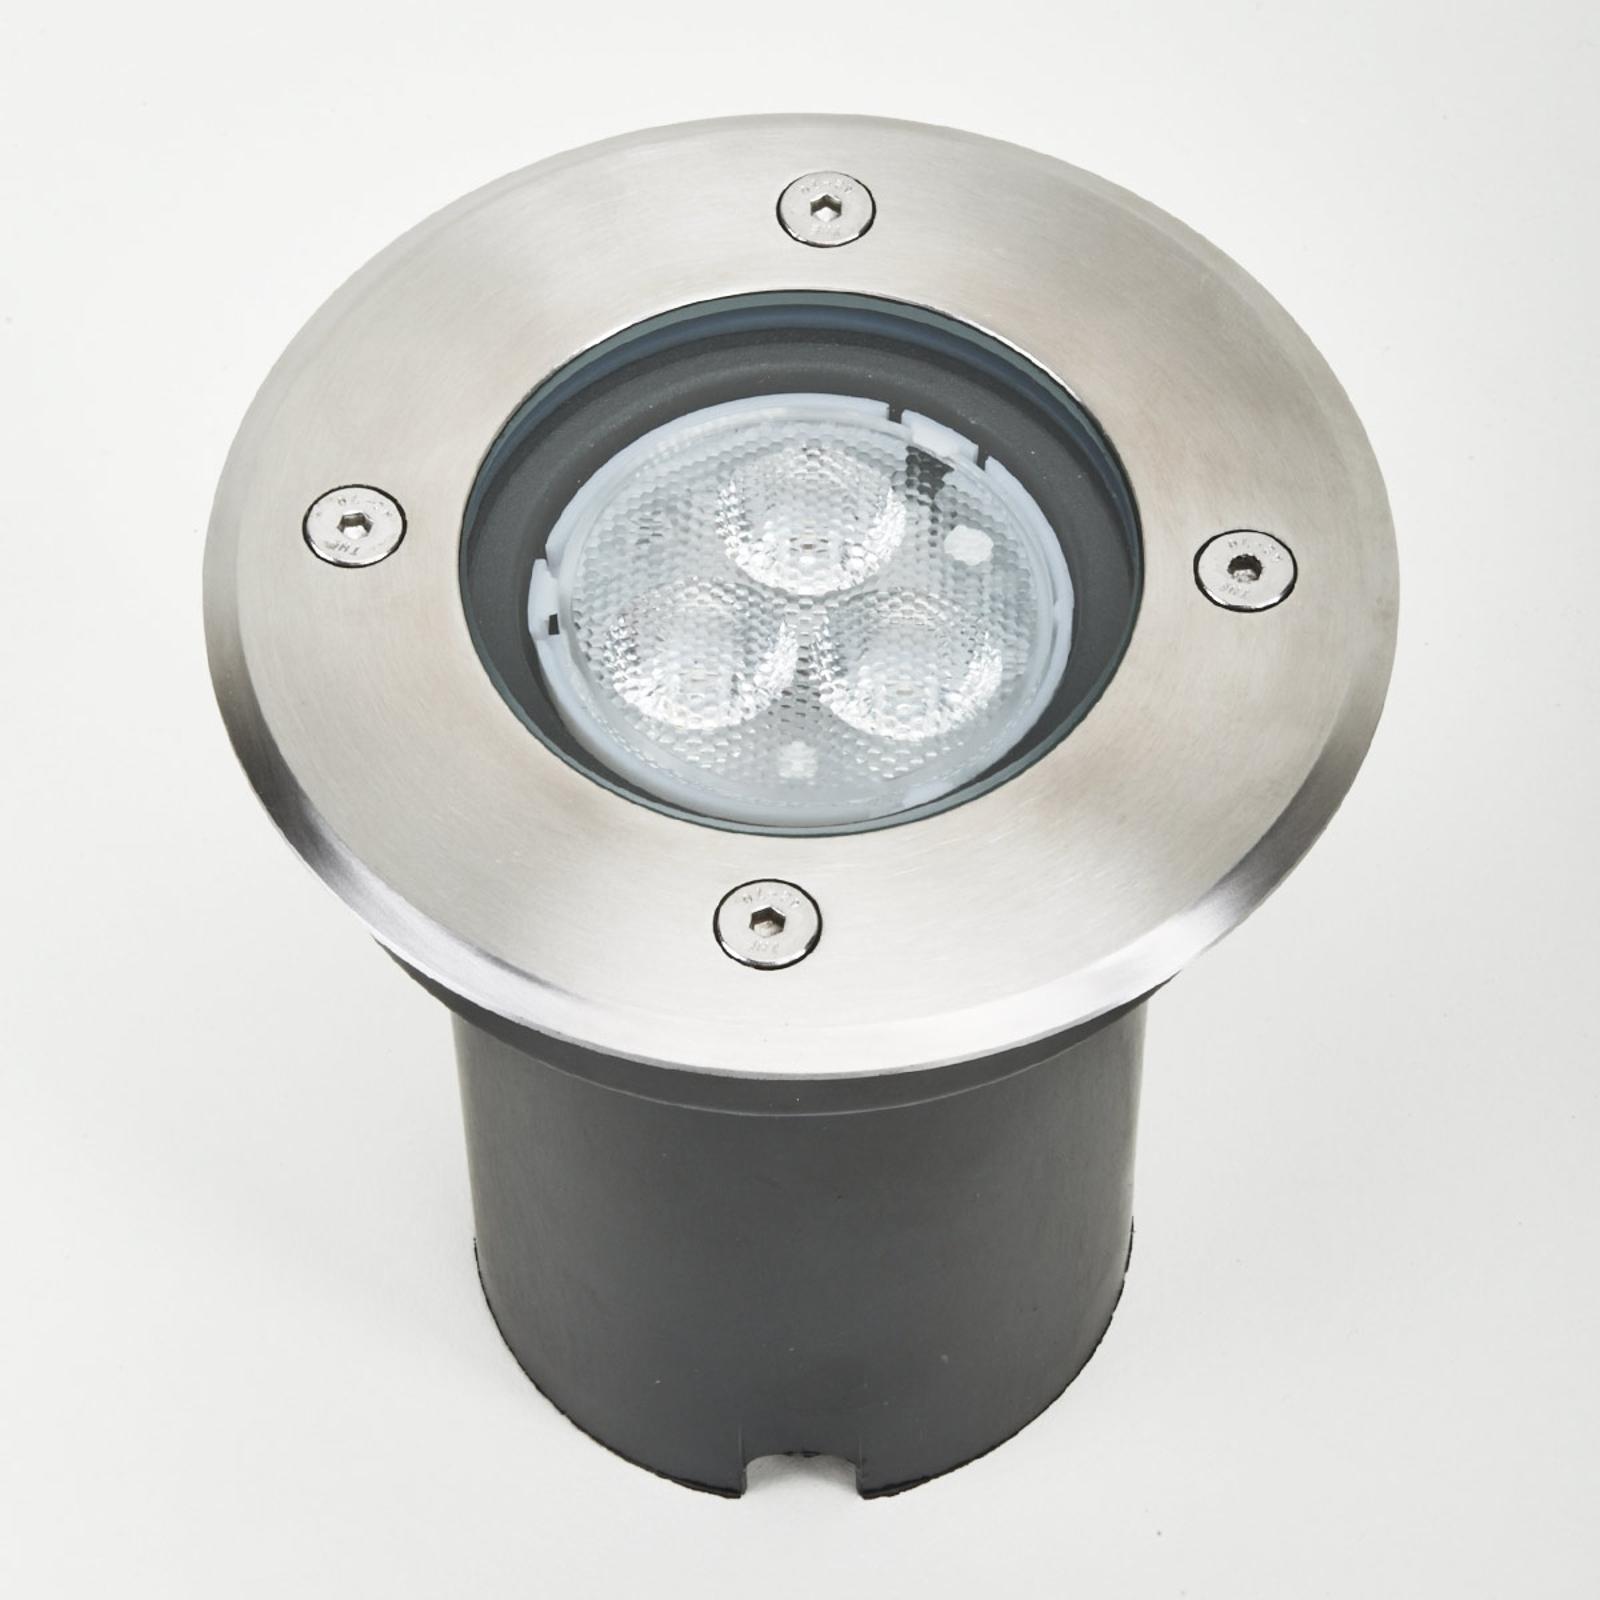 IP67 - LED-vloerinbouwlamp Ava, rond